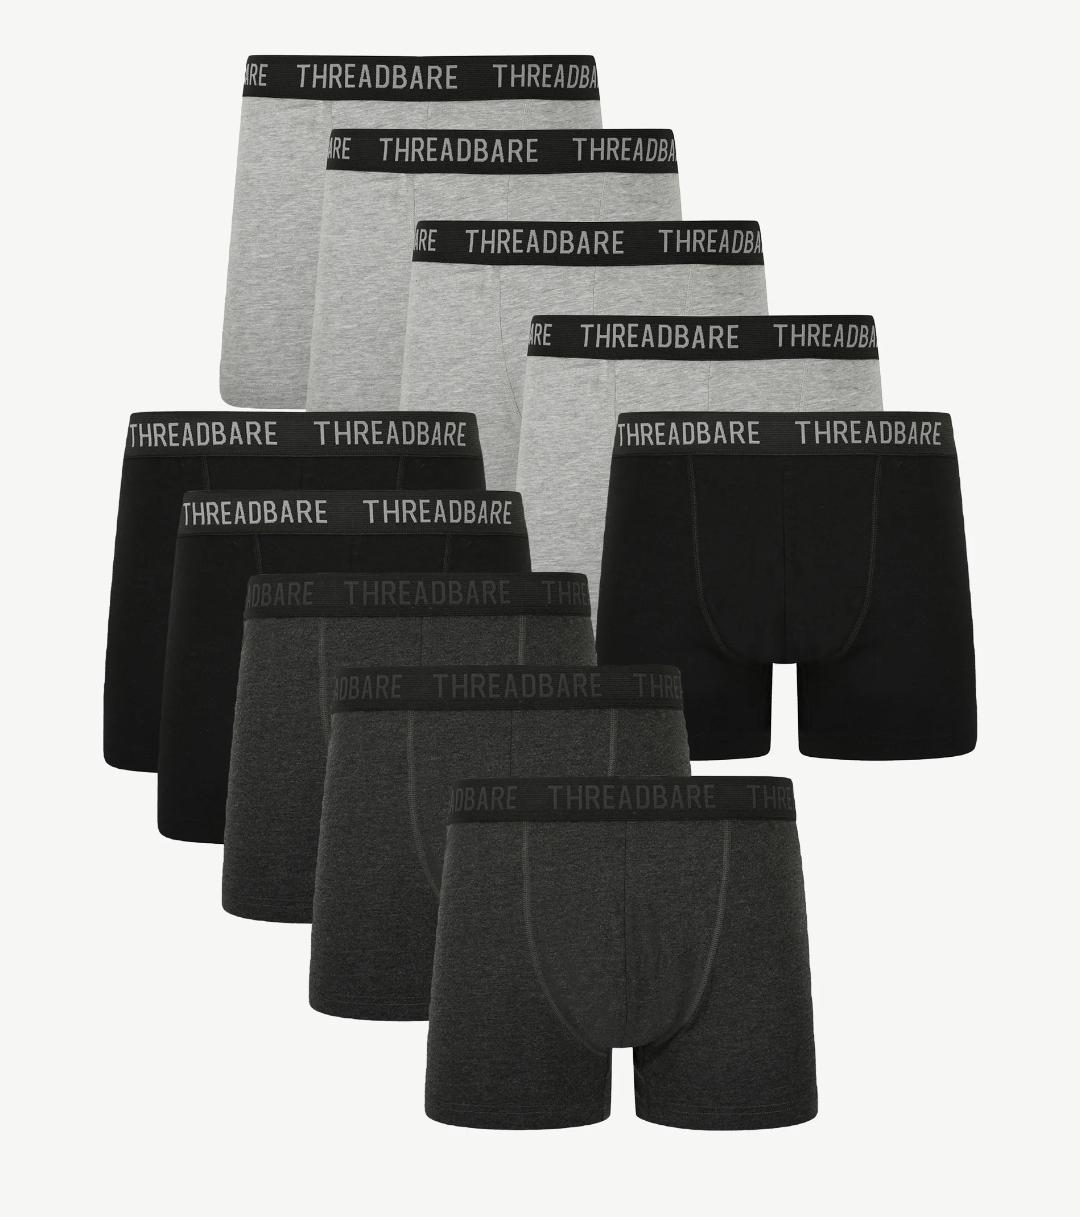 Mens Threadbare 10 pack Underwear Now €34.95 Free delivery @ Zalando